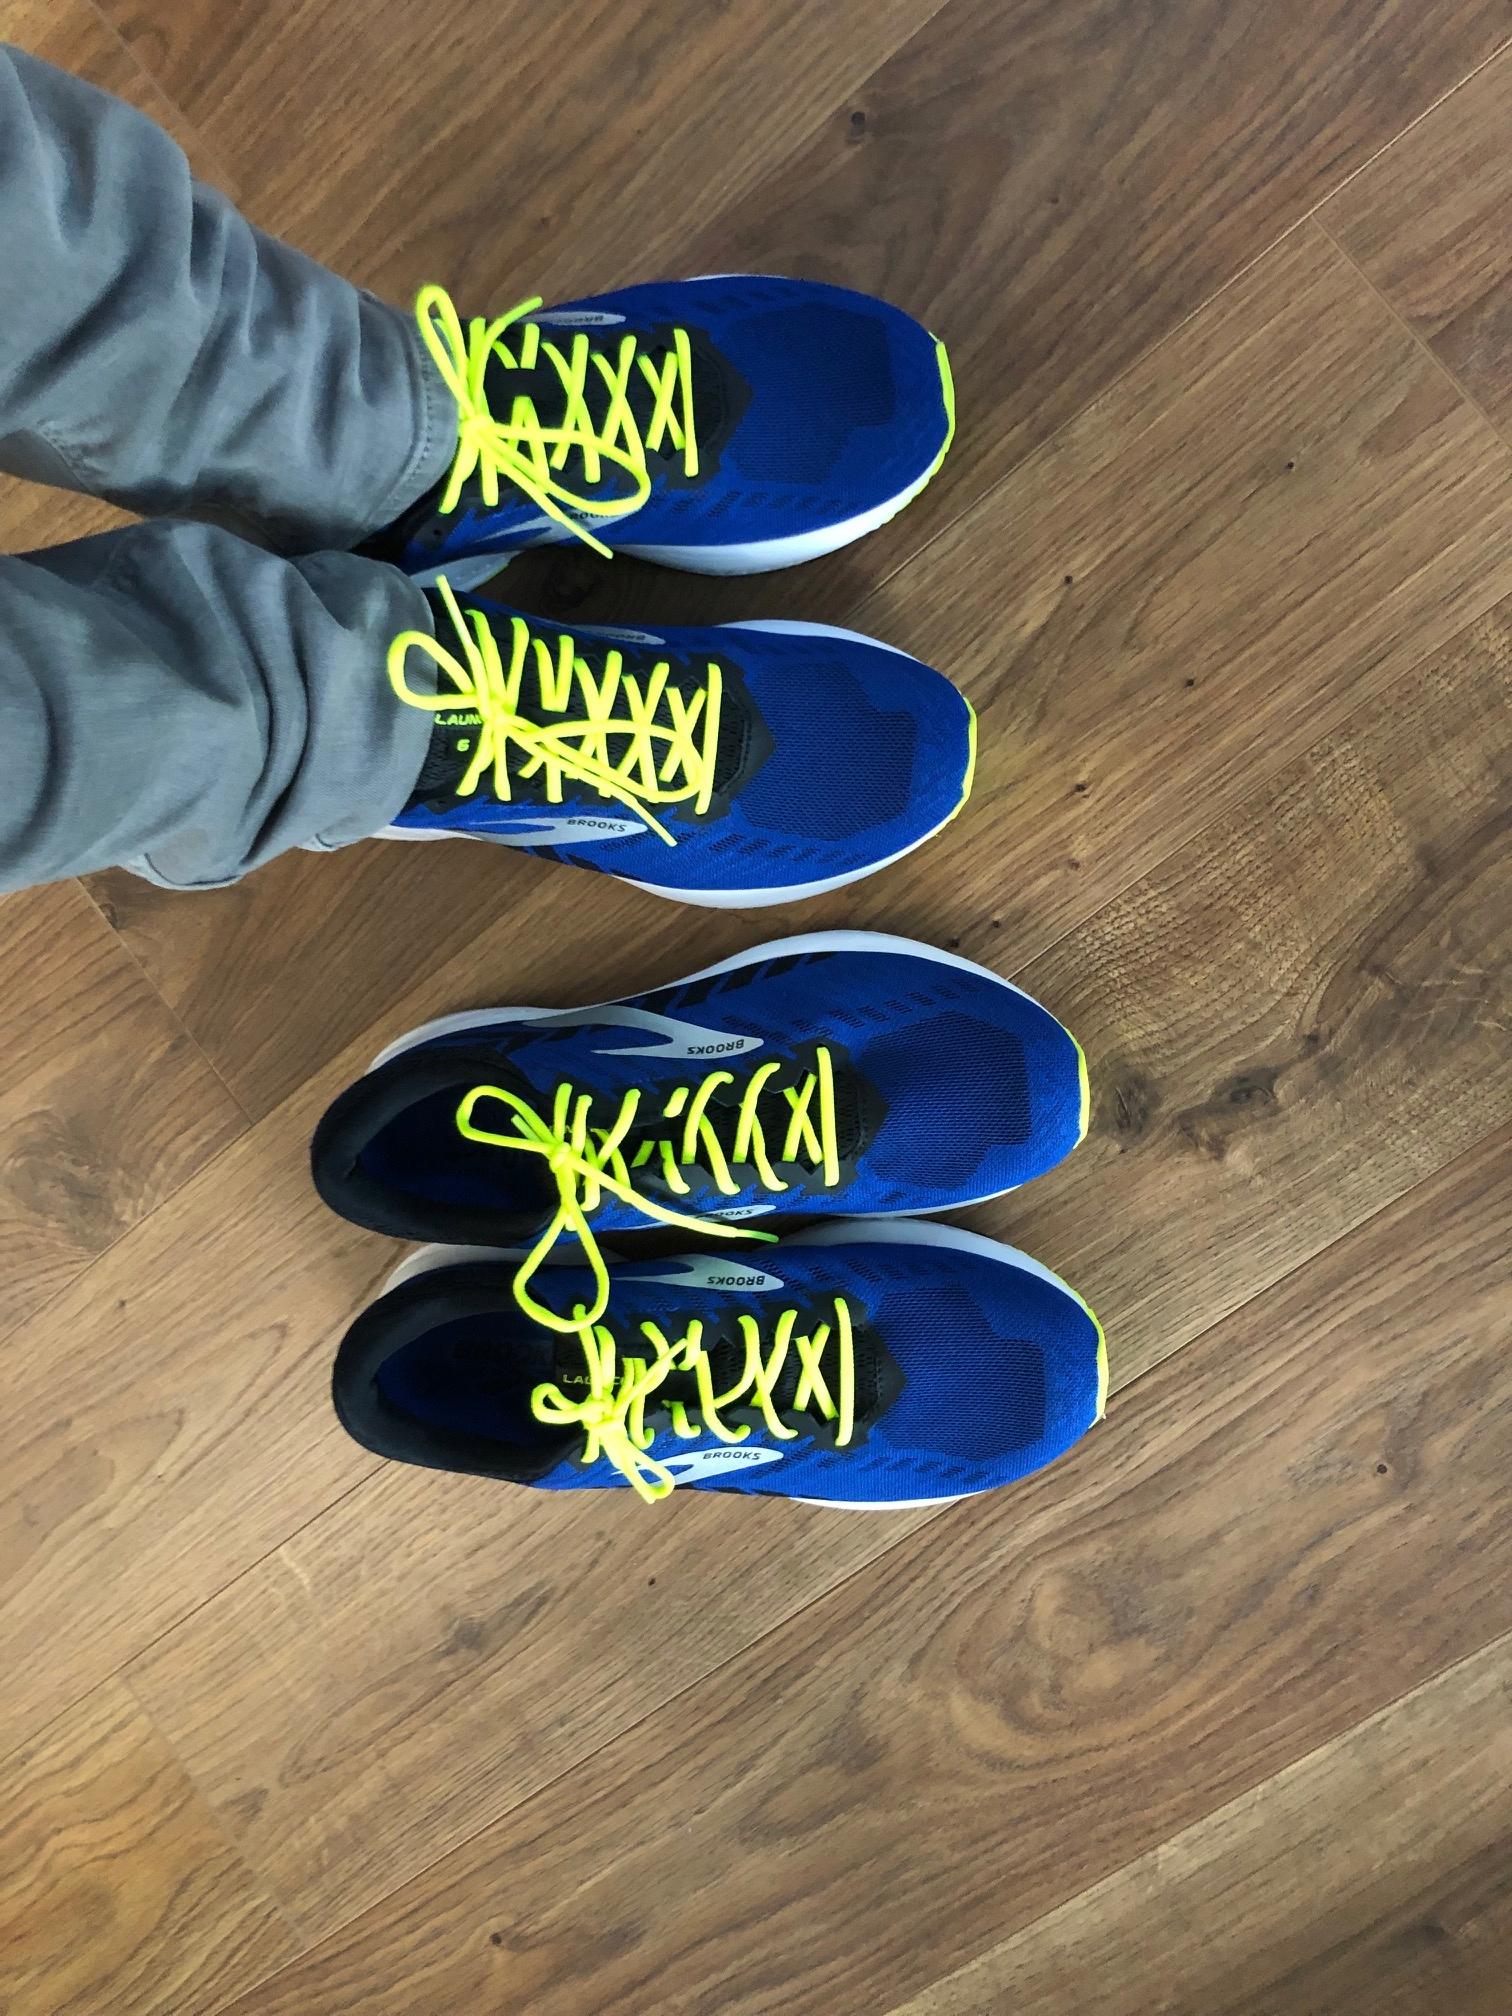 Buty do biegania, Brooks Launch 6, buty na maraton